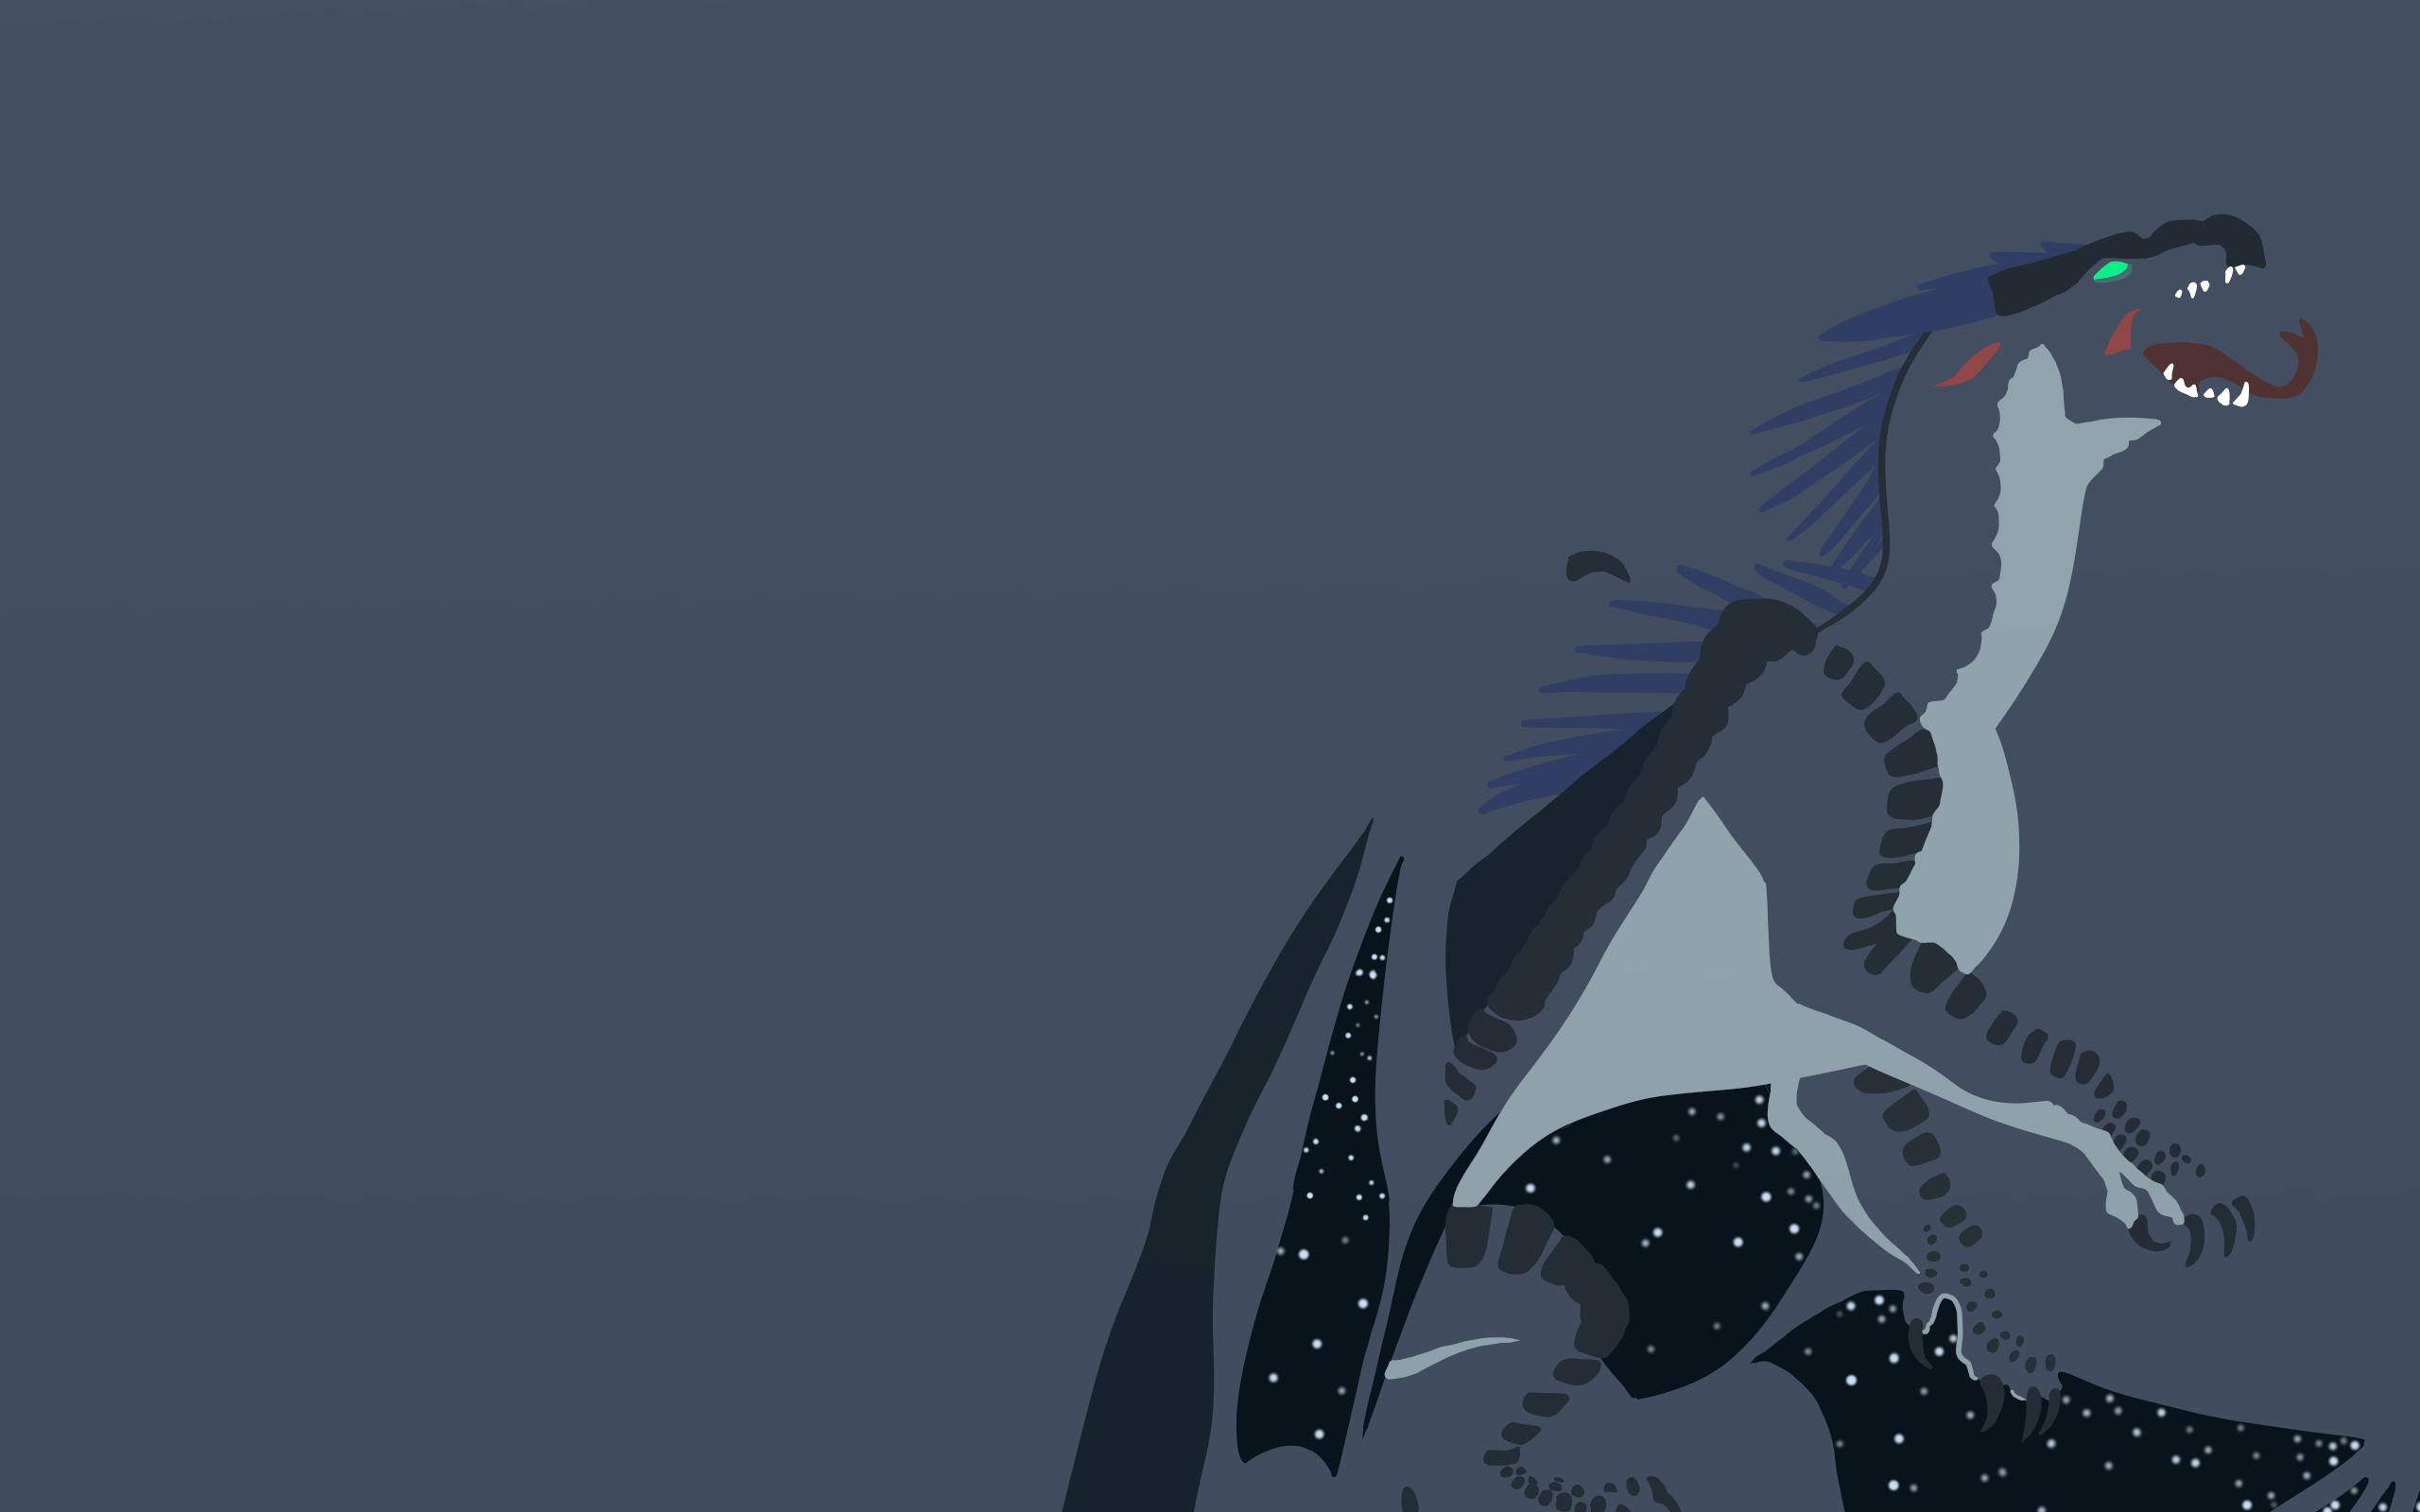 Starflight Wallpaper By Gdtrekkie On Deviantart